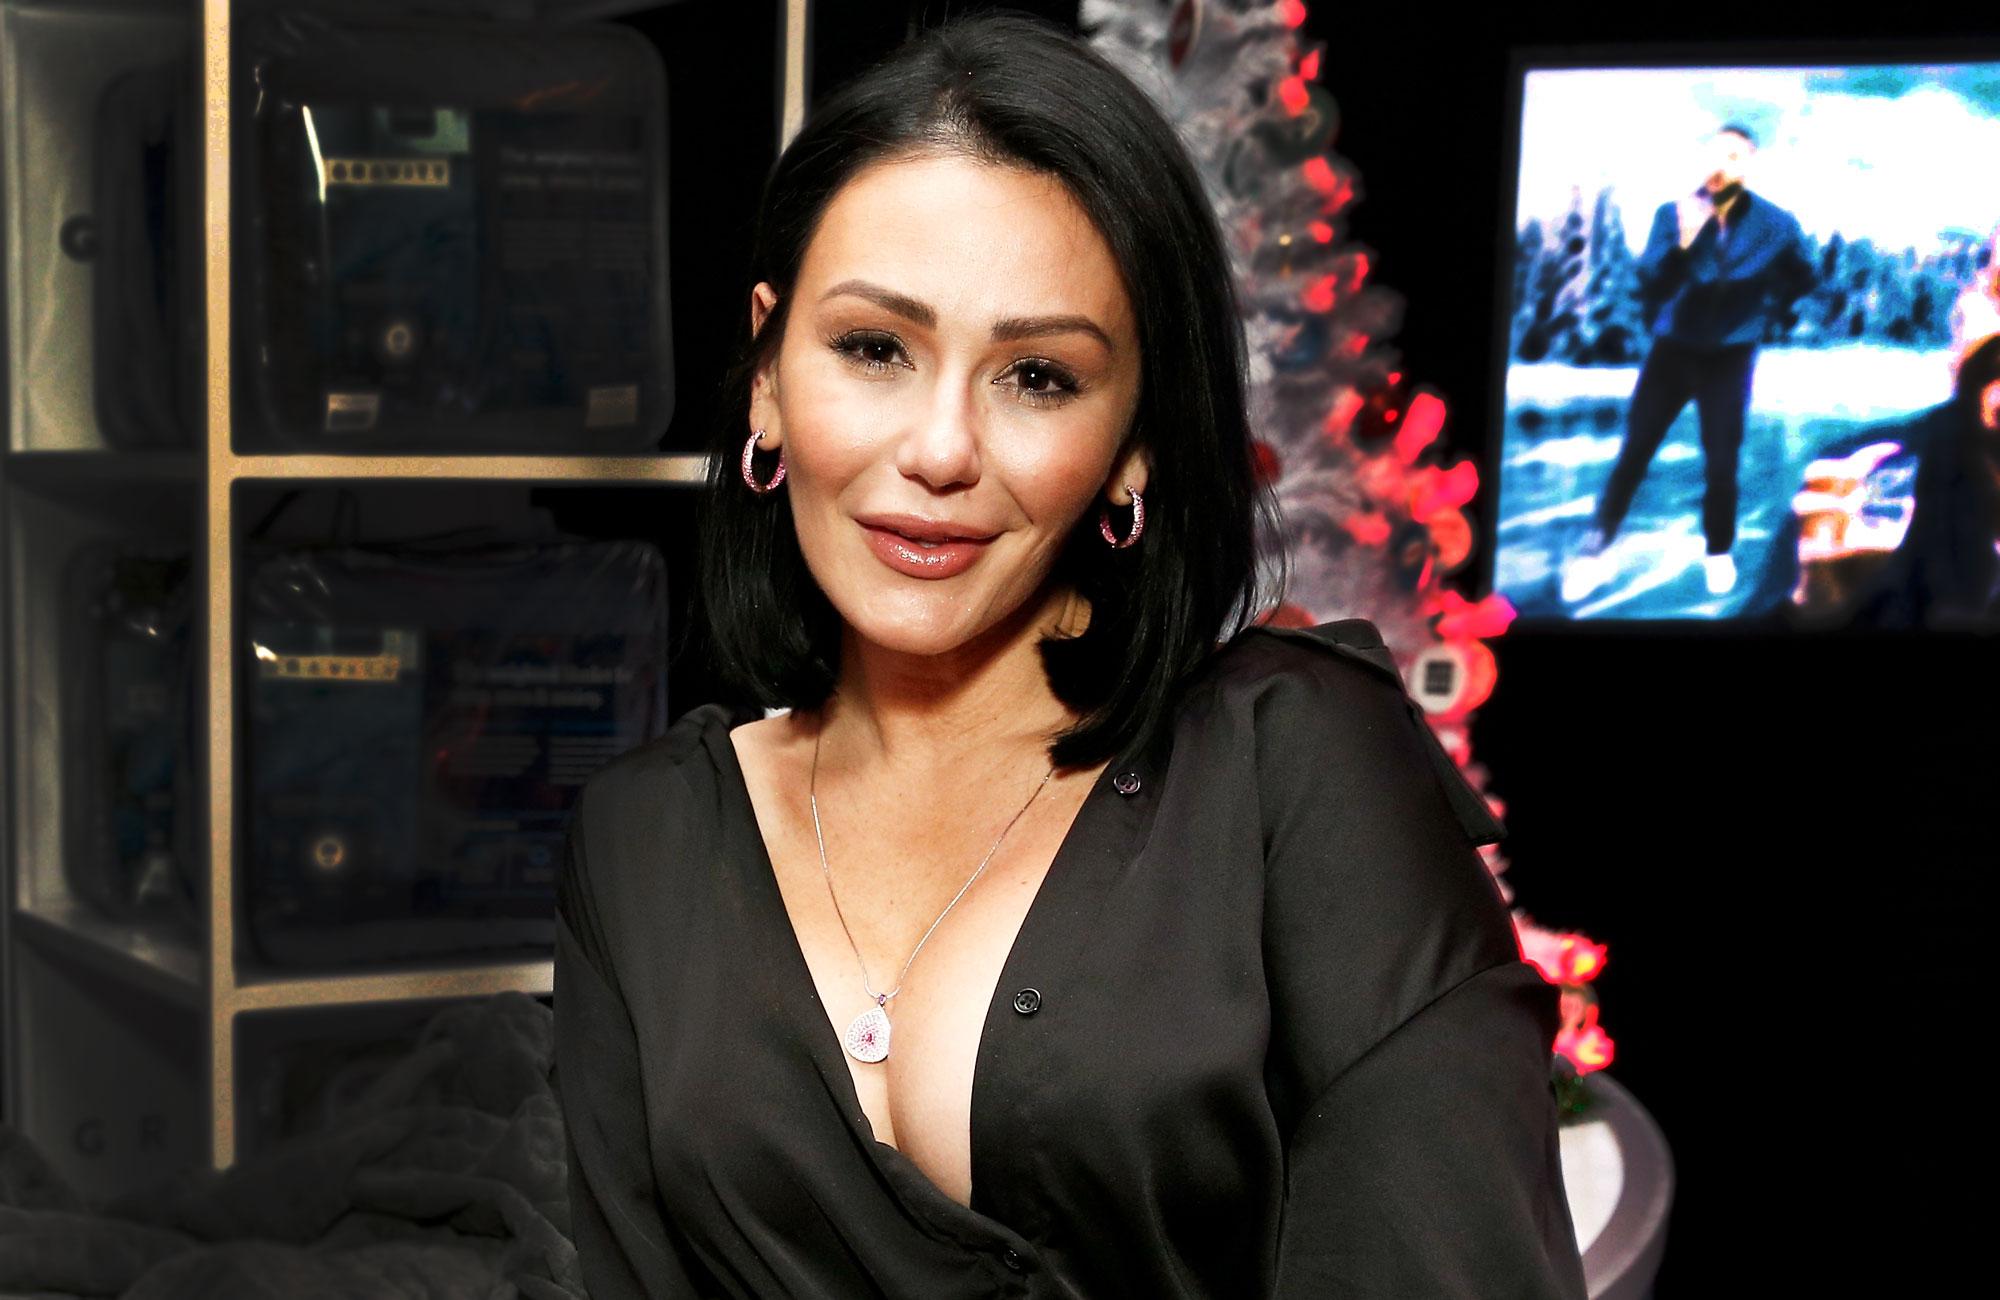 Jenni 'JWoww' Farley Reveals She Has a 24-Year-Old Boyfriend Amid Divorce From Roger Mathews